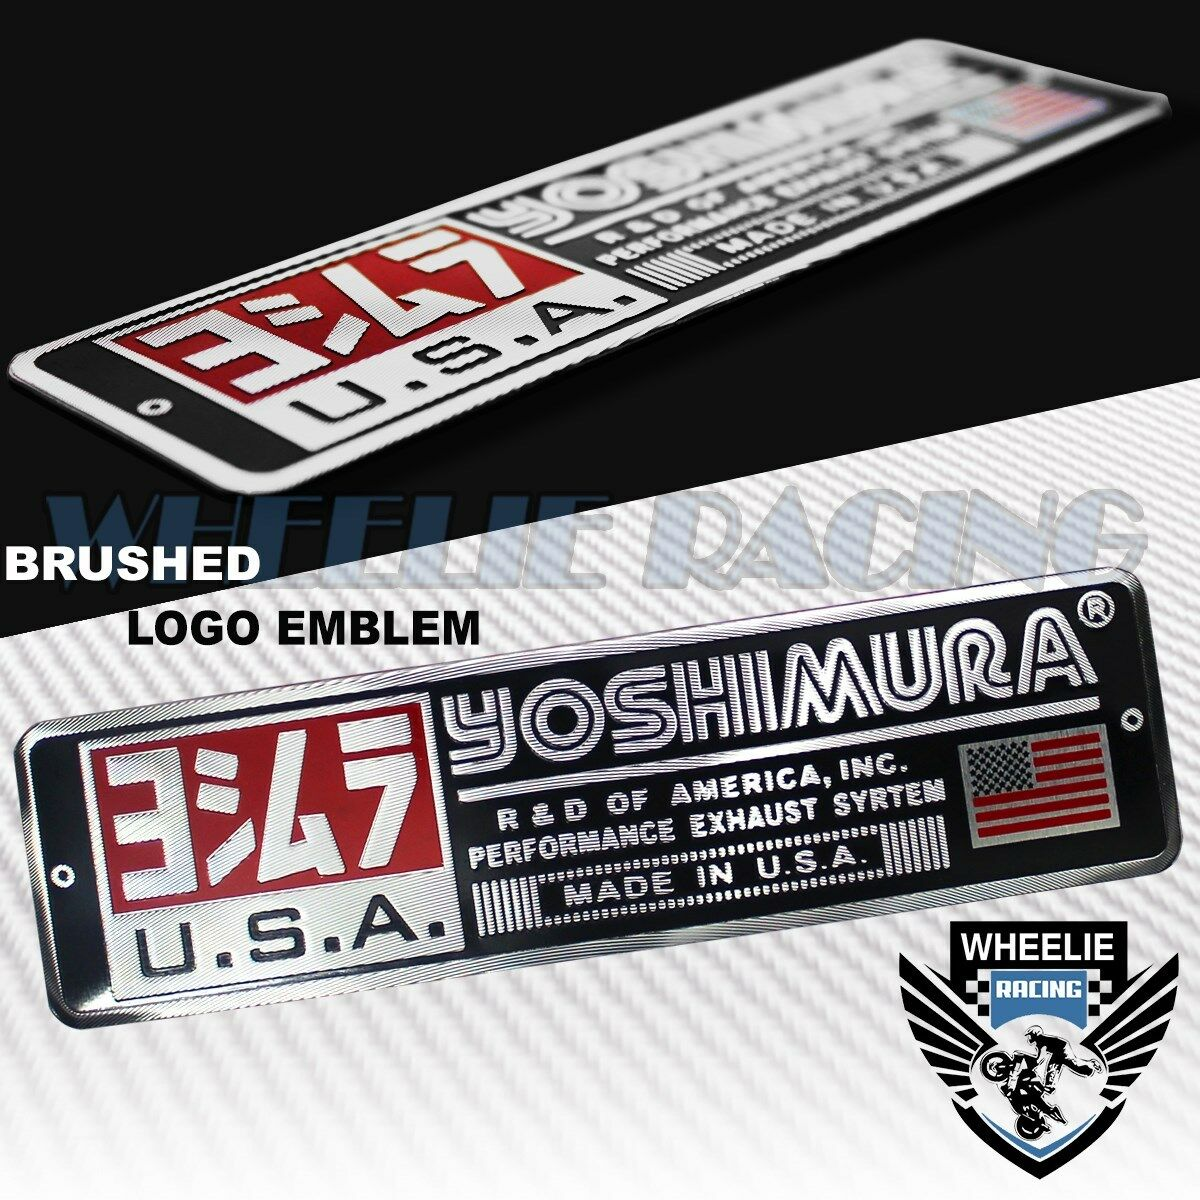 Details about metal 5 53d brushed aluminum emblem decal yoshimura logo letter fairing sticker